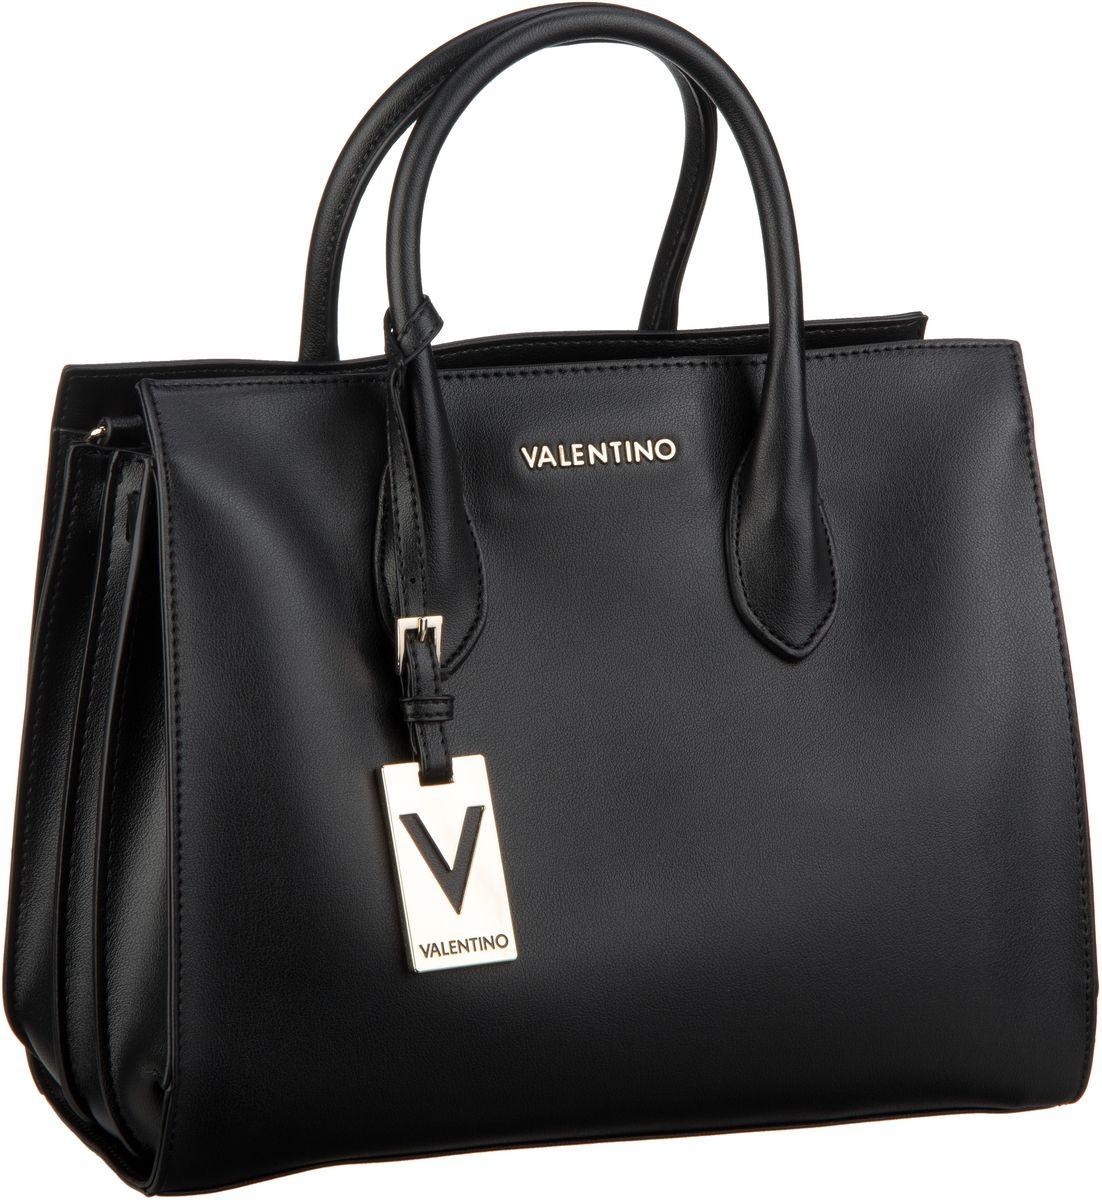 Bags Handtasche Memento Shopping M01 Nero